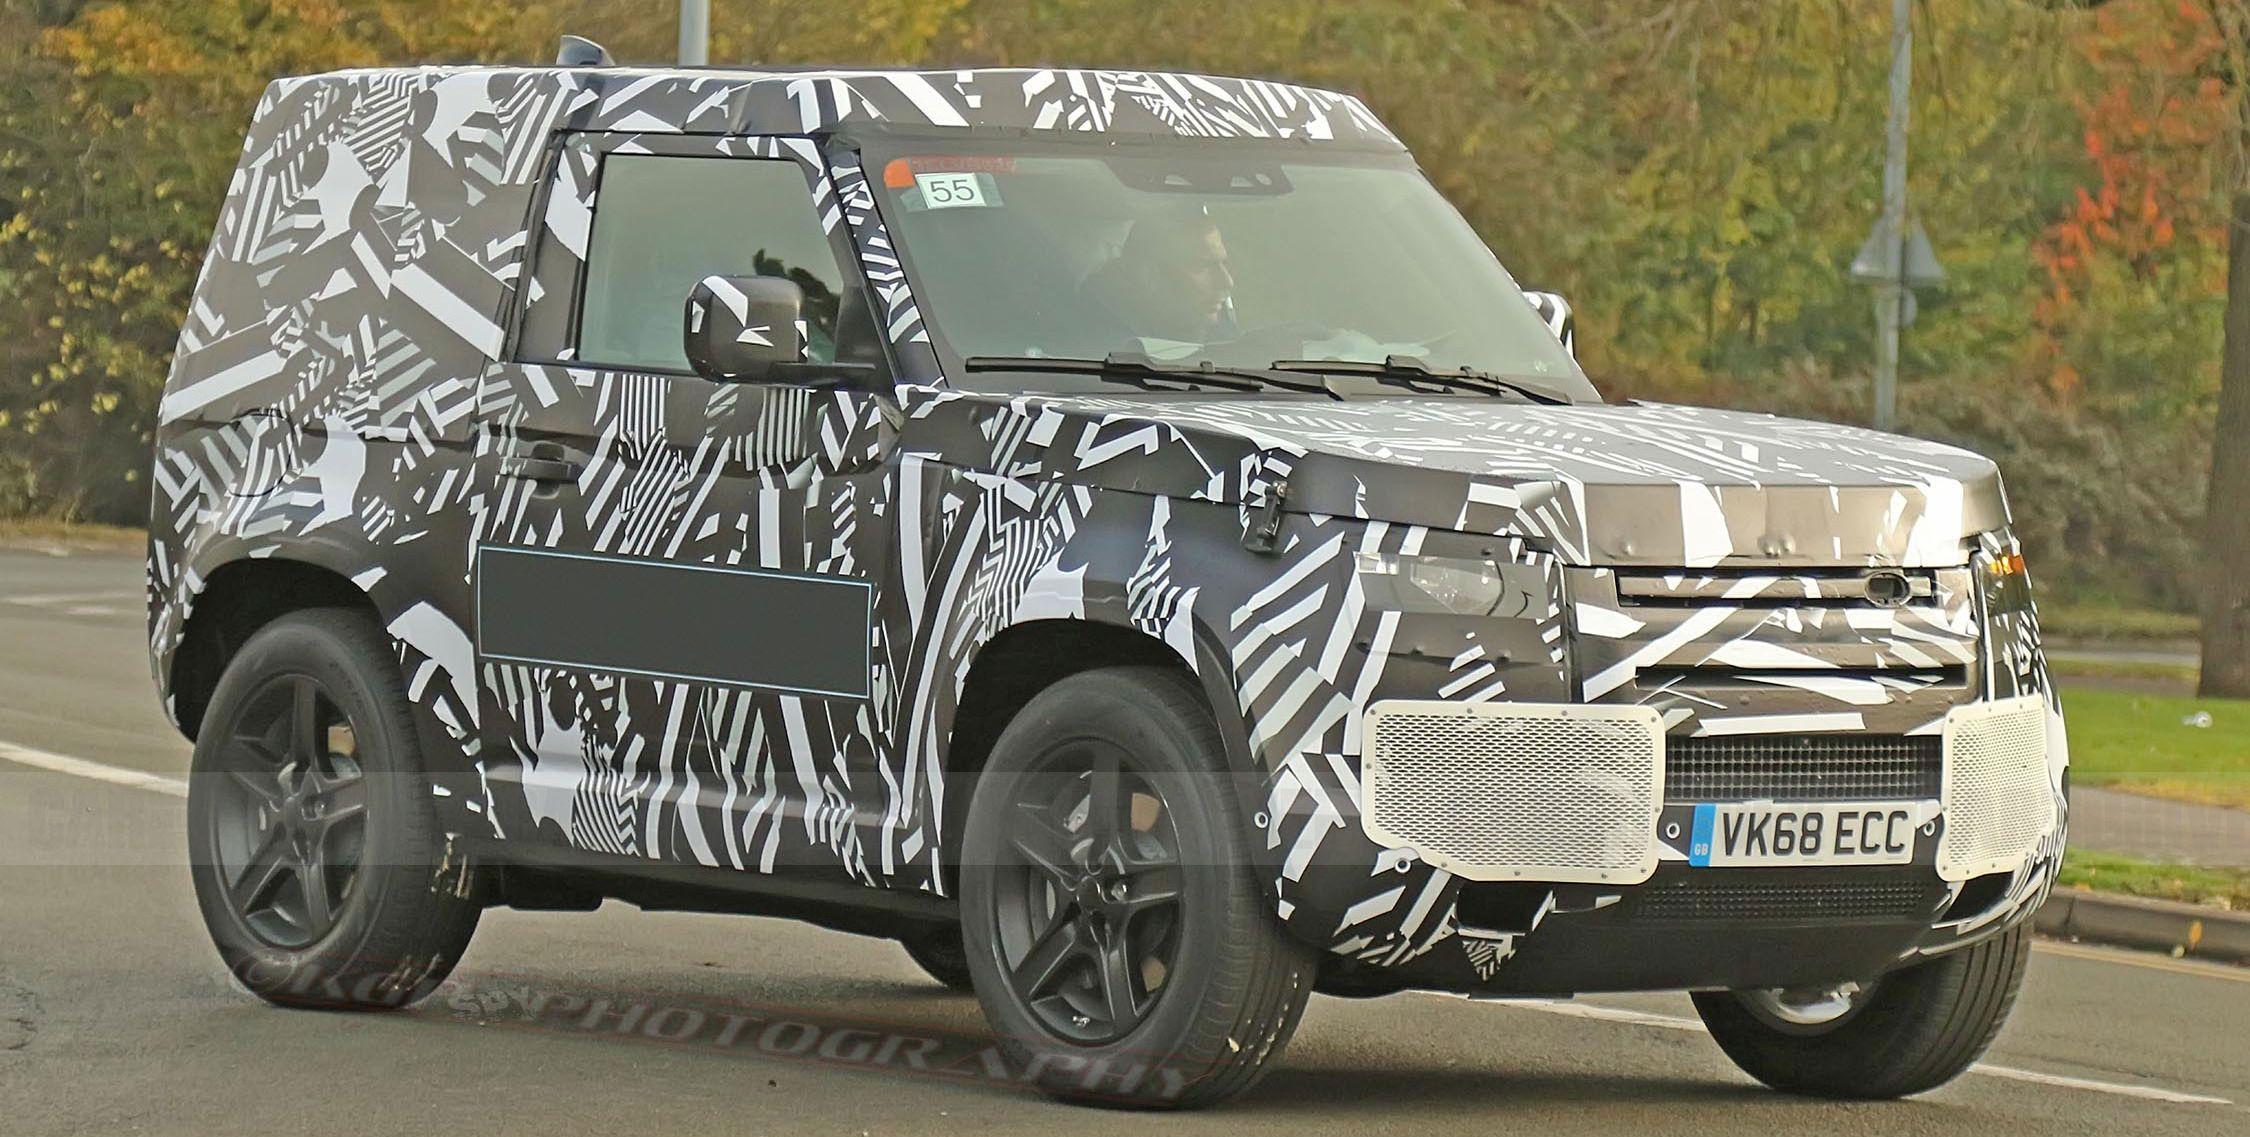 2020 Land Rover Defender Spy Shots - New Land Rover SUV ...